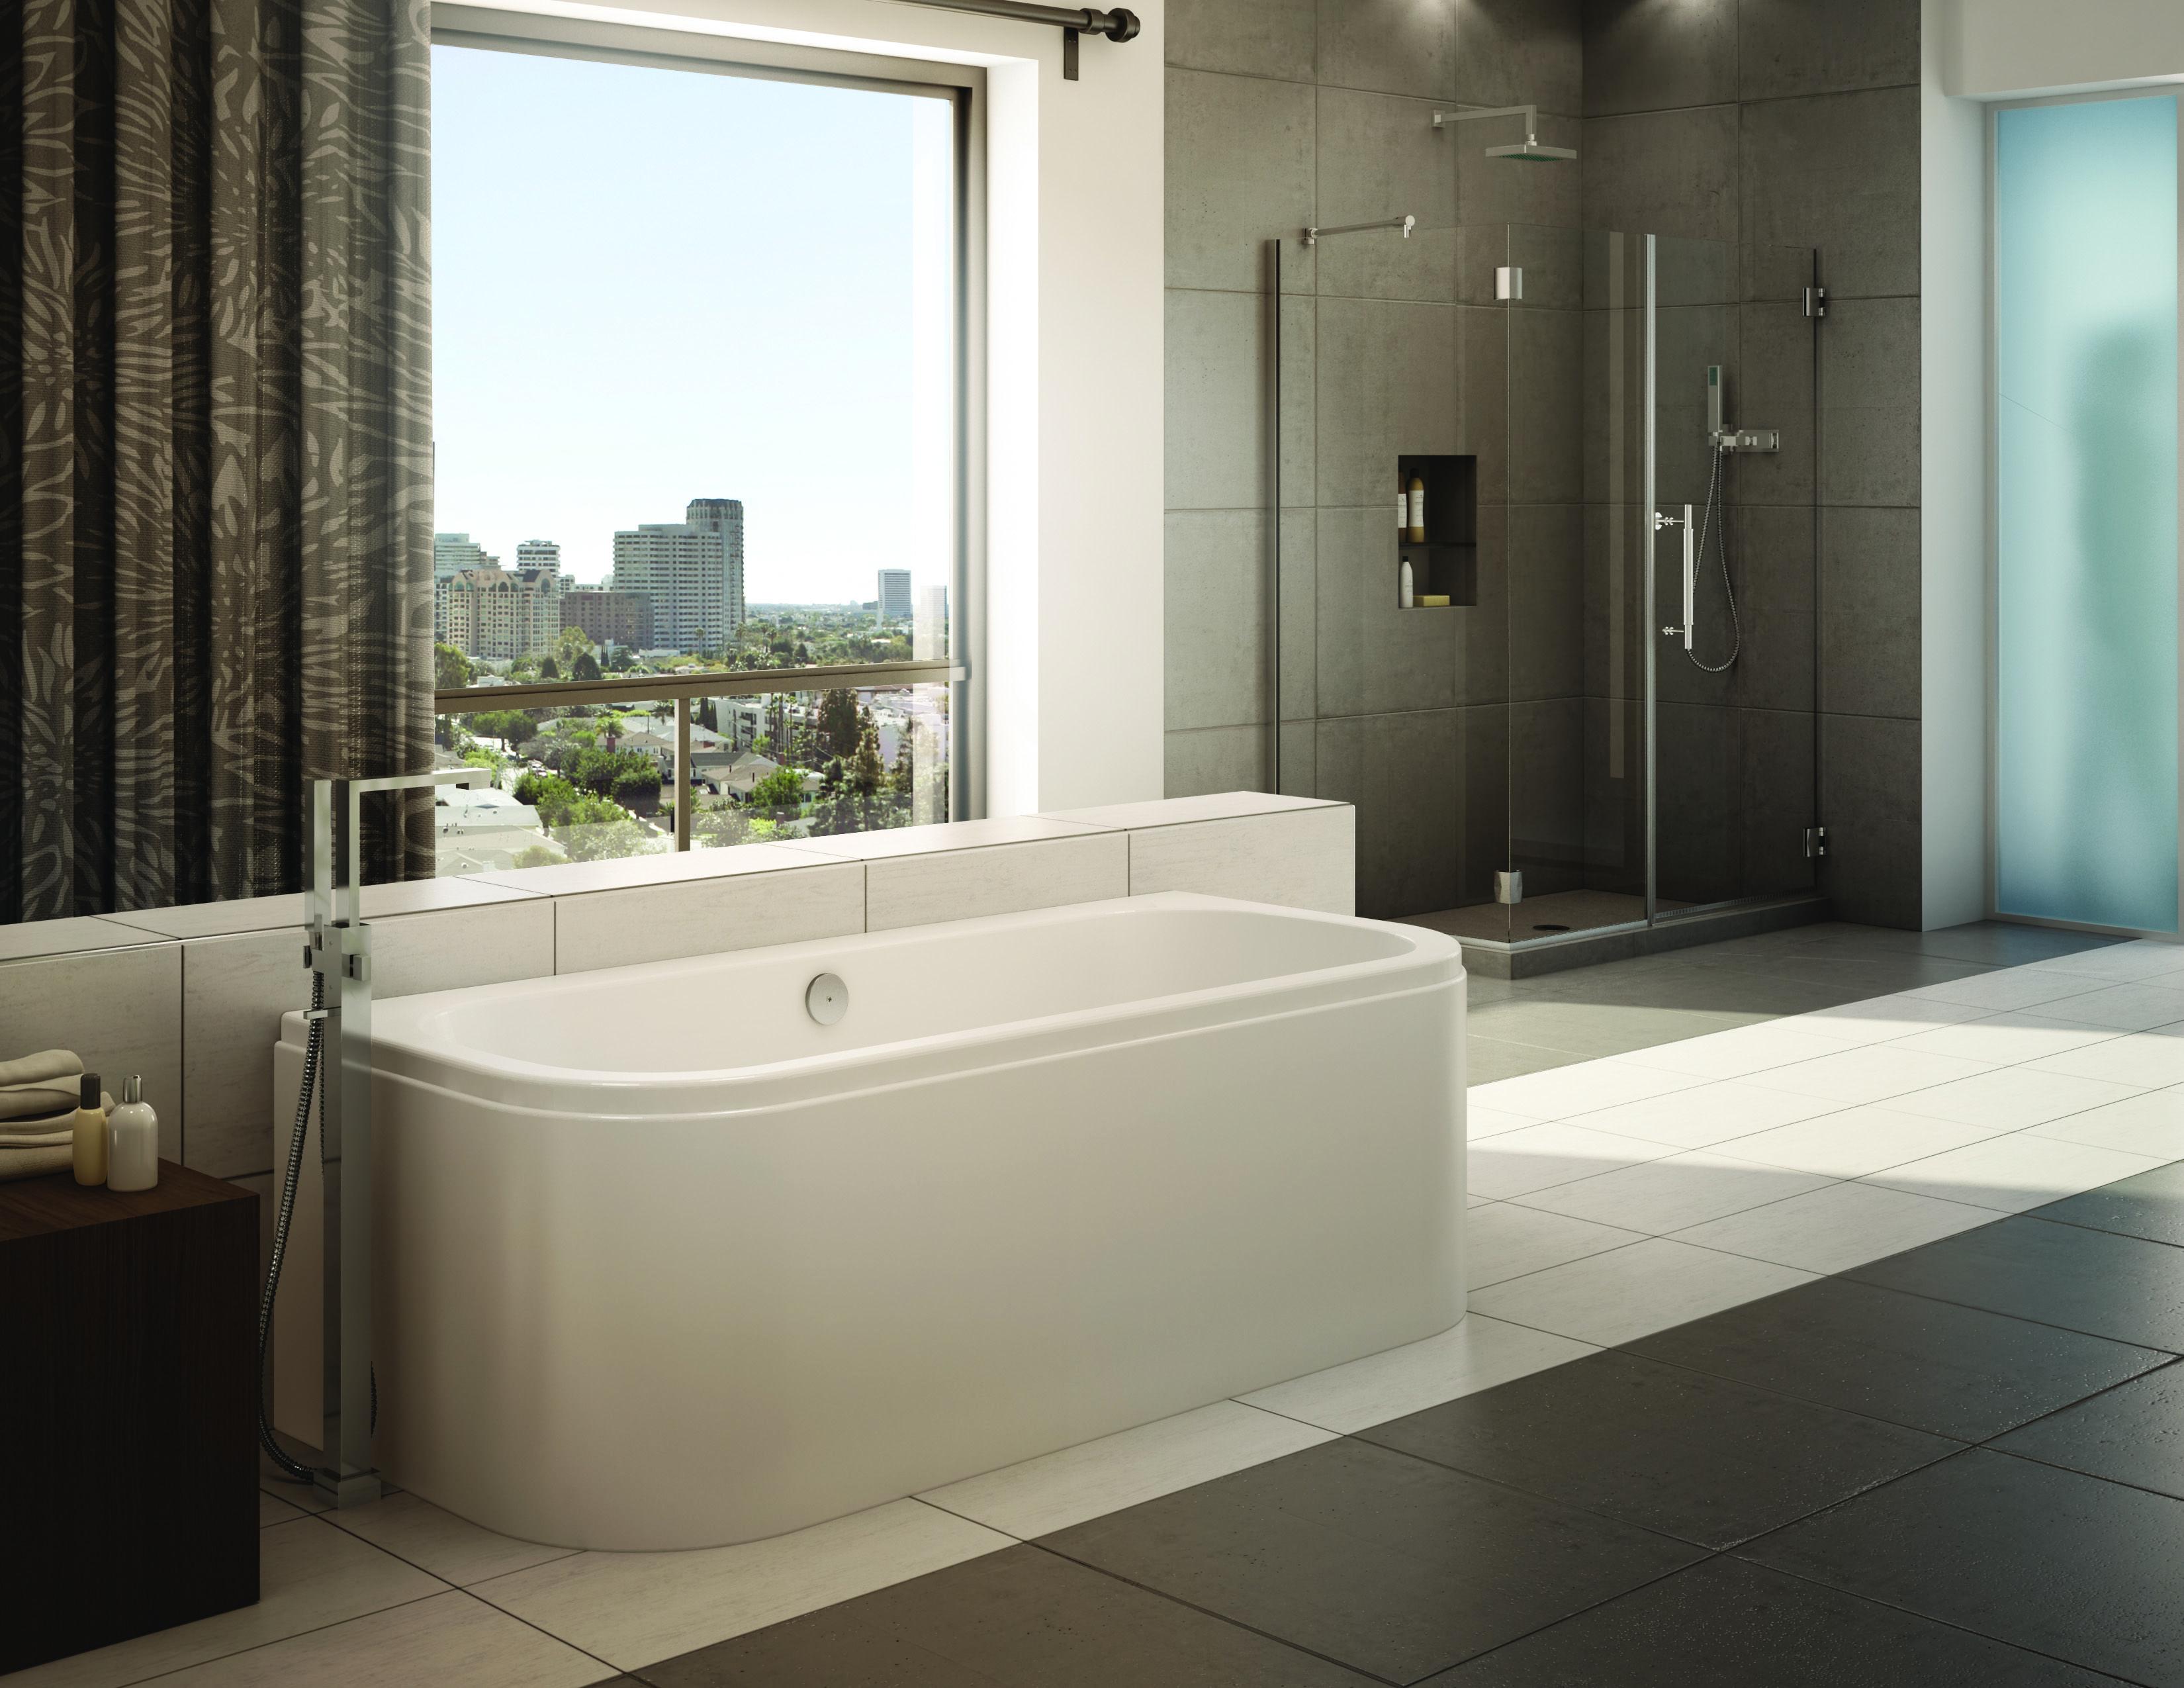 Fleurco Bathtub Unity Bathrooms Remodel Bathroom Remodeling Contractors Bathroom Design [ 2550 x 3300 Pixel ]